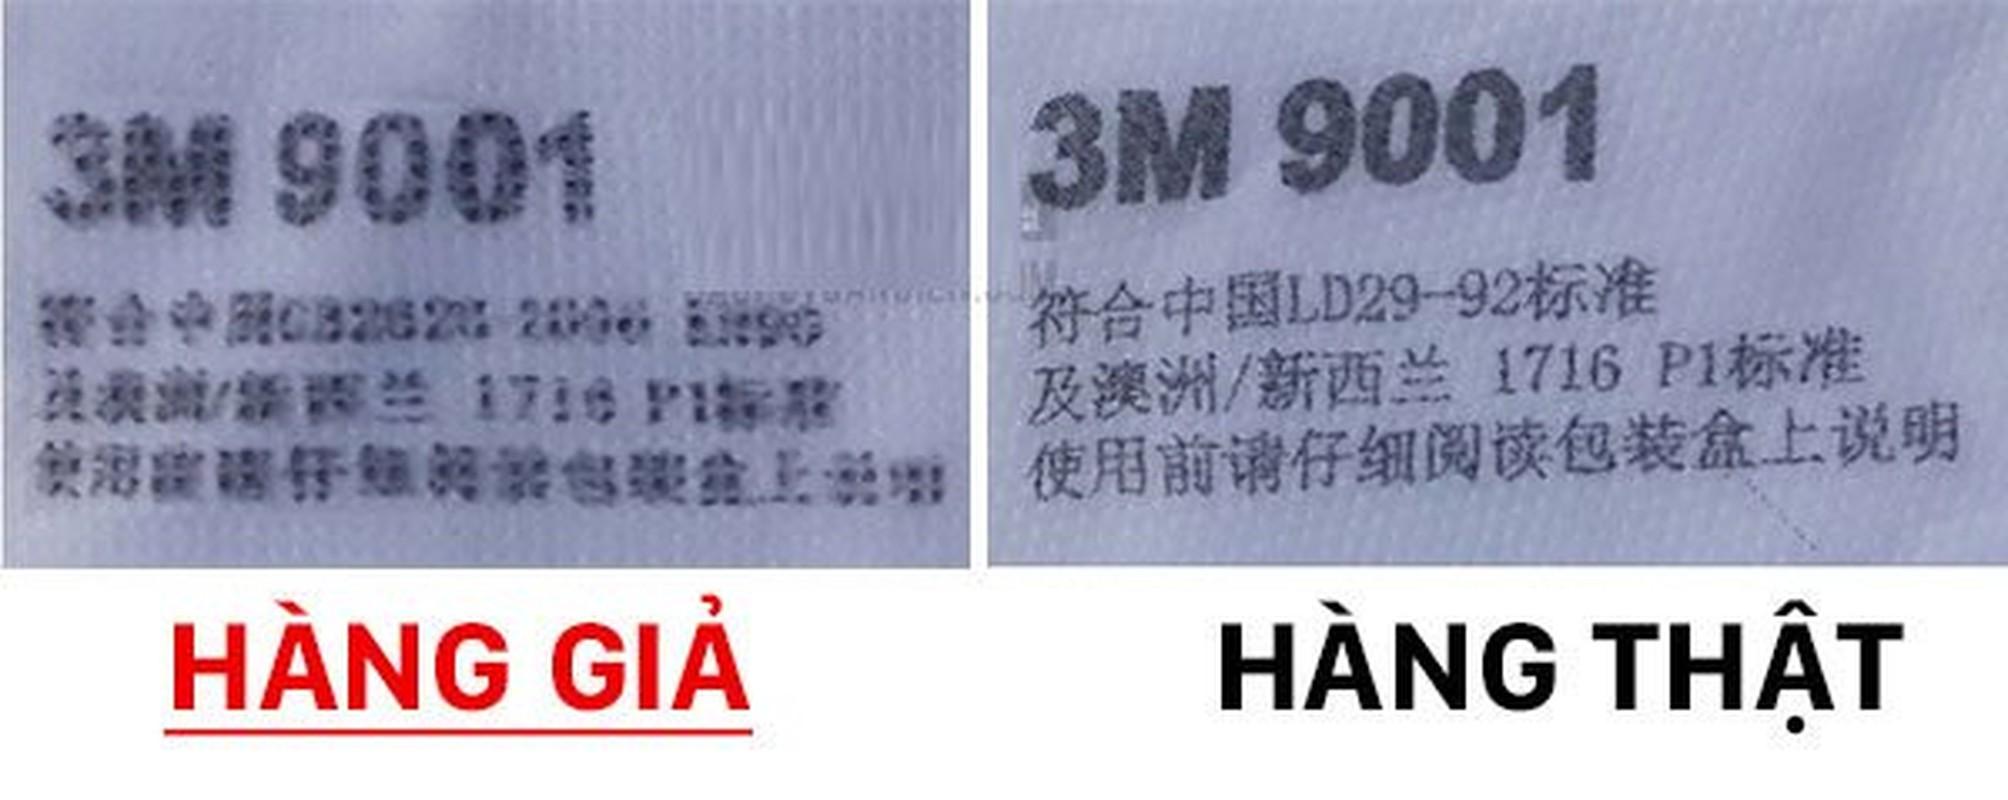 Khau trang 3M gia cua Cty Nam Anh: Hang that khac do nhai the nao?-Hinh-3